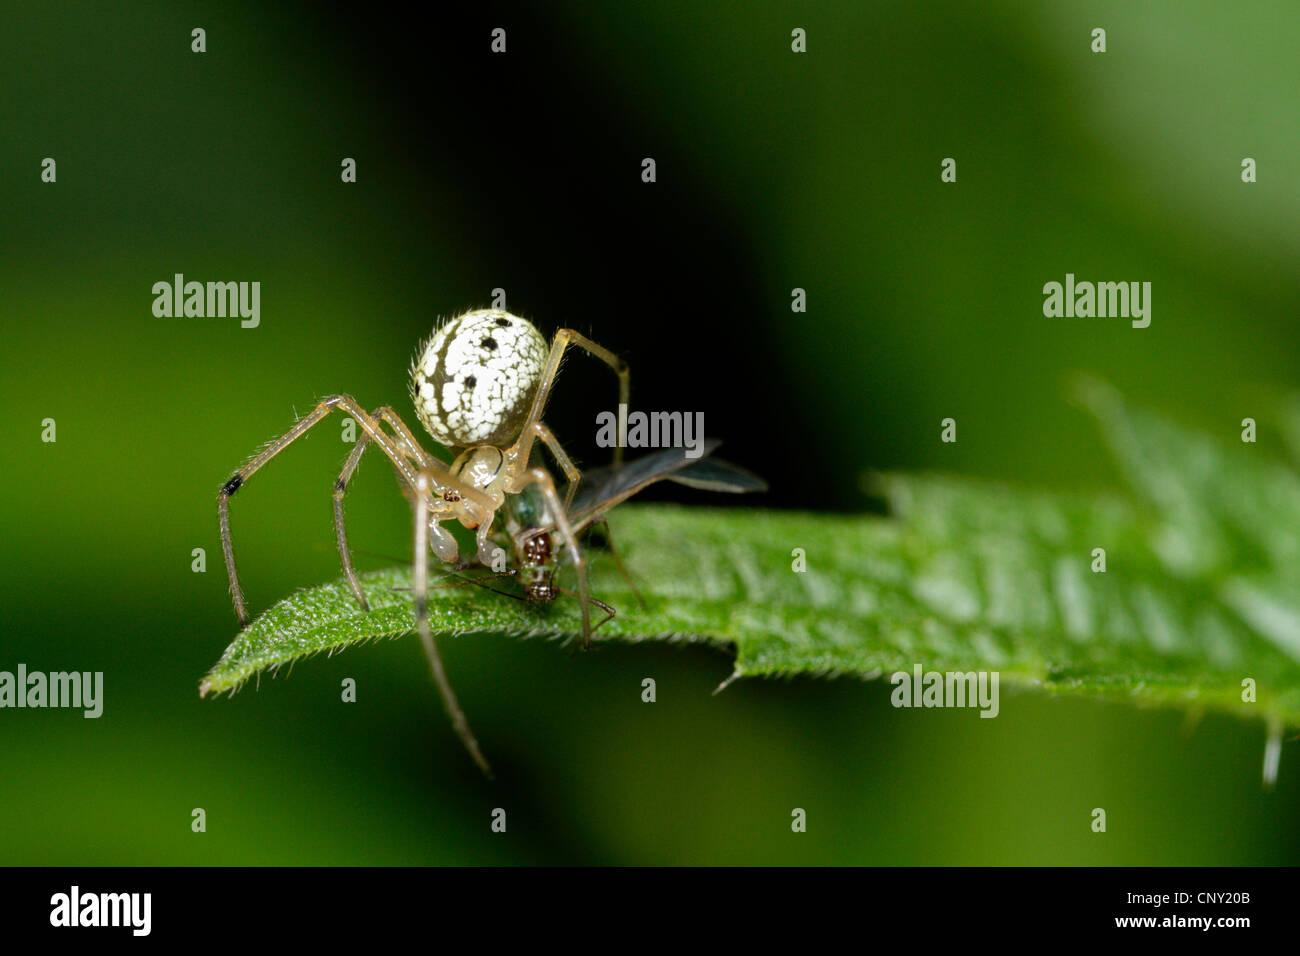 Enoplognatha ovata (Enoplognatha ovata), male tries to capture an aphid, Germany, Bavaria - Stock Image